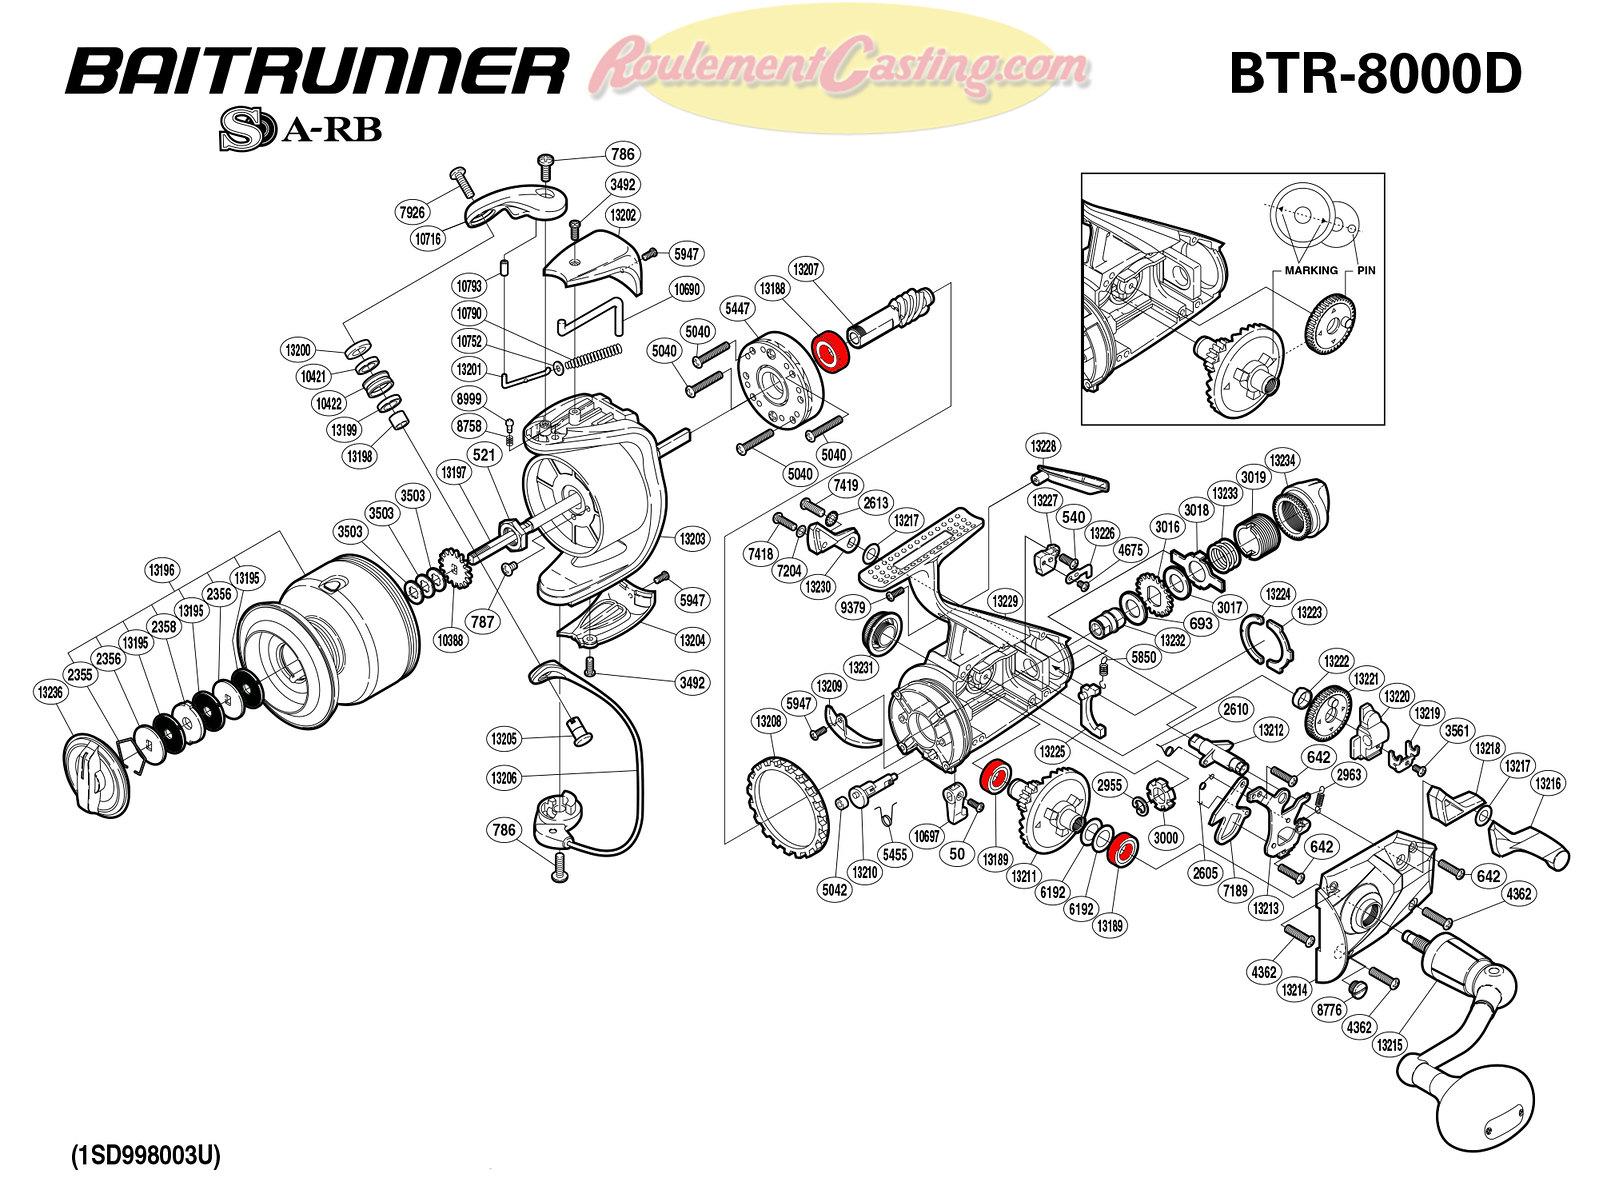 Schema-Shimano-BAITRUNNER-8000D.